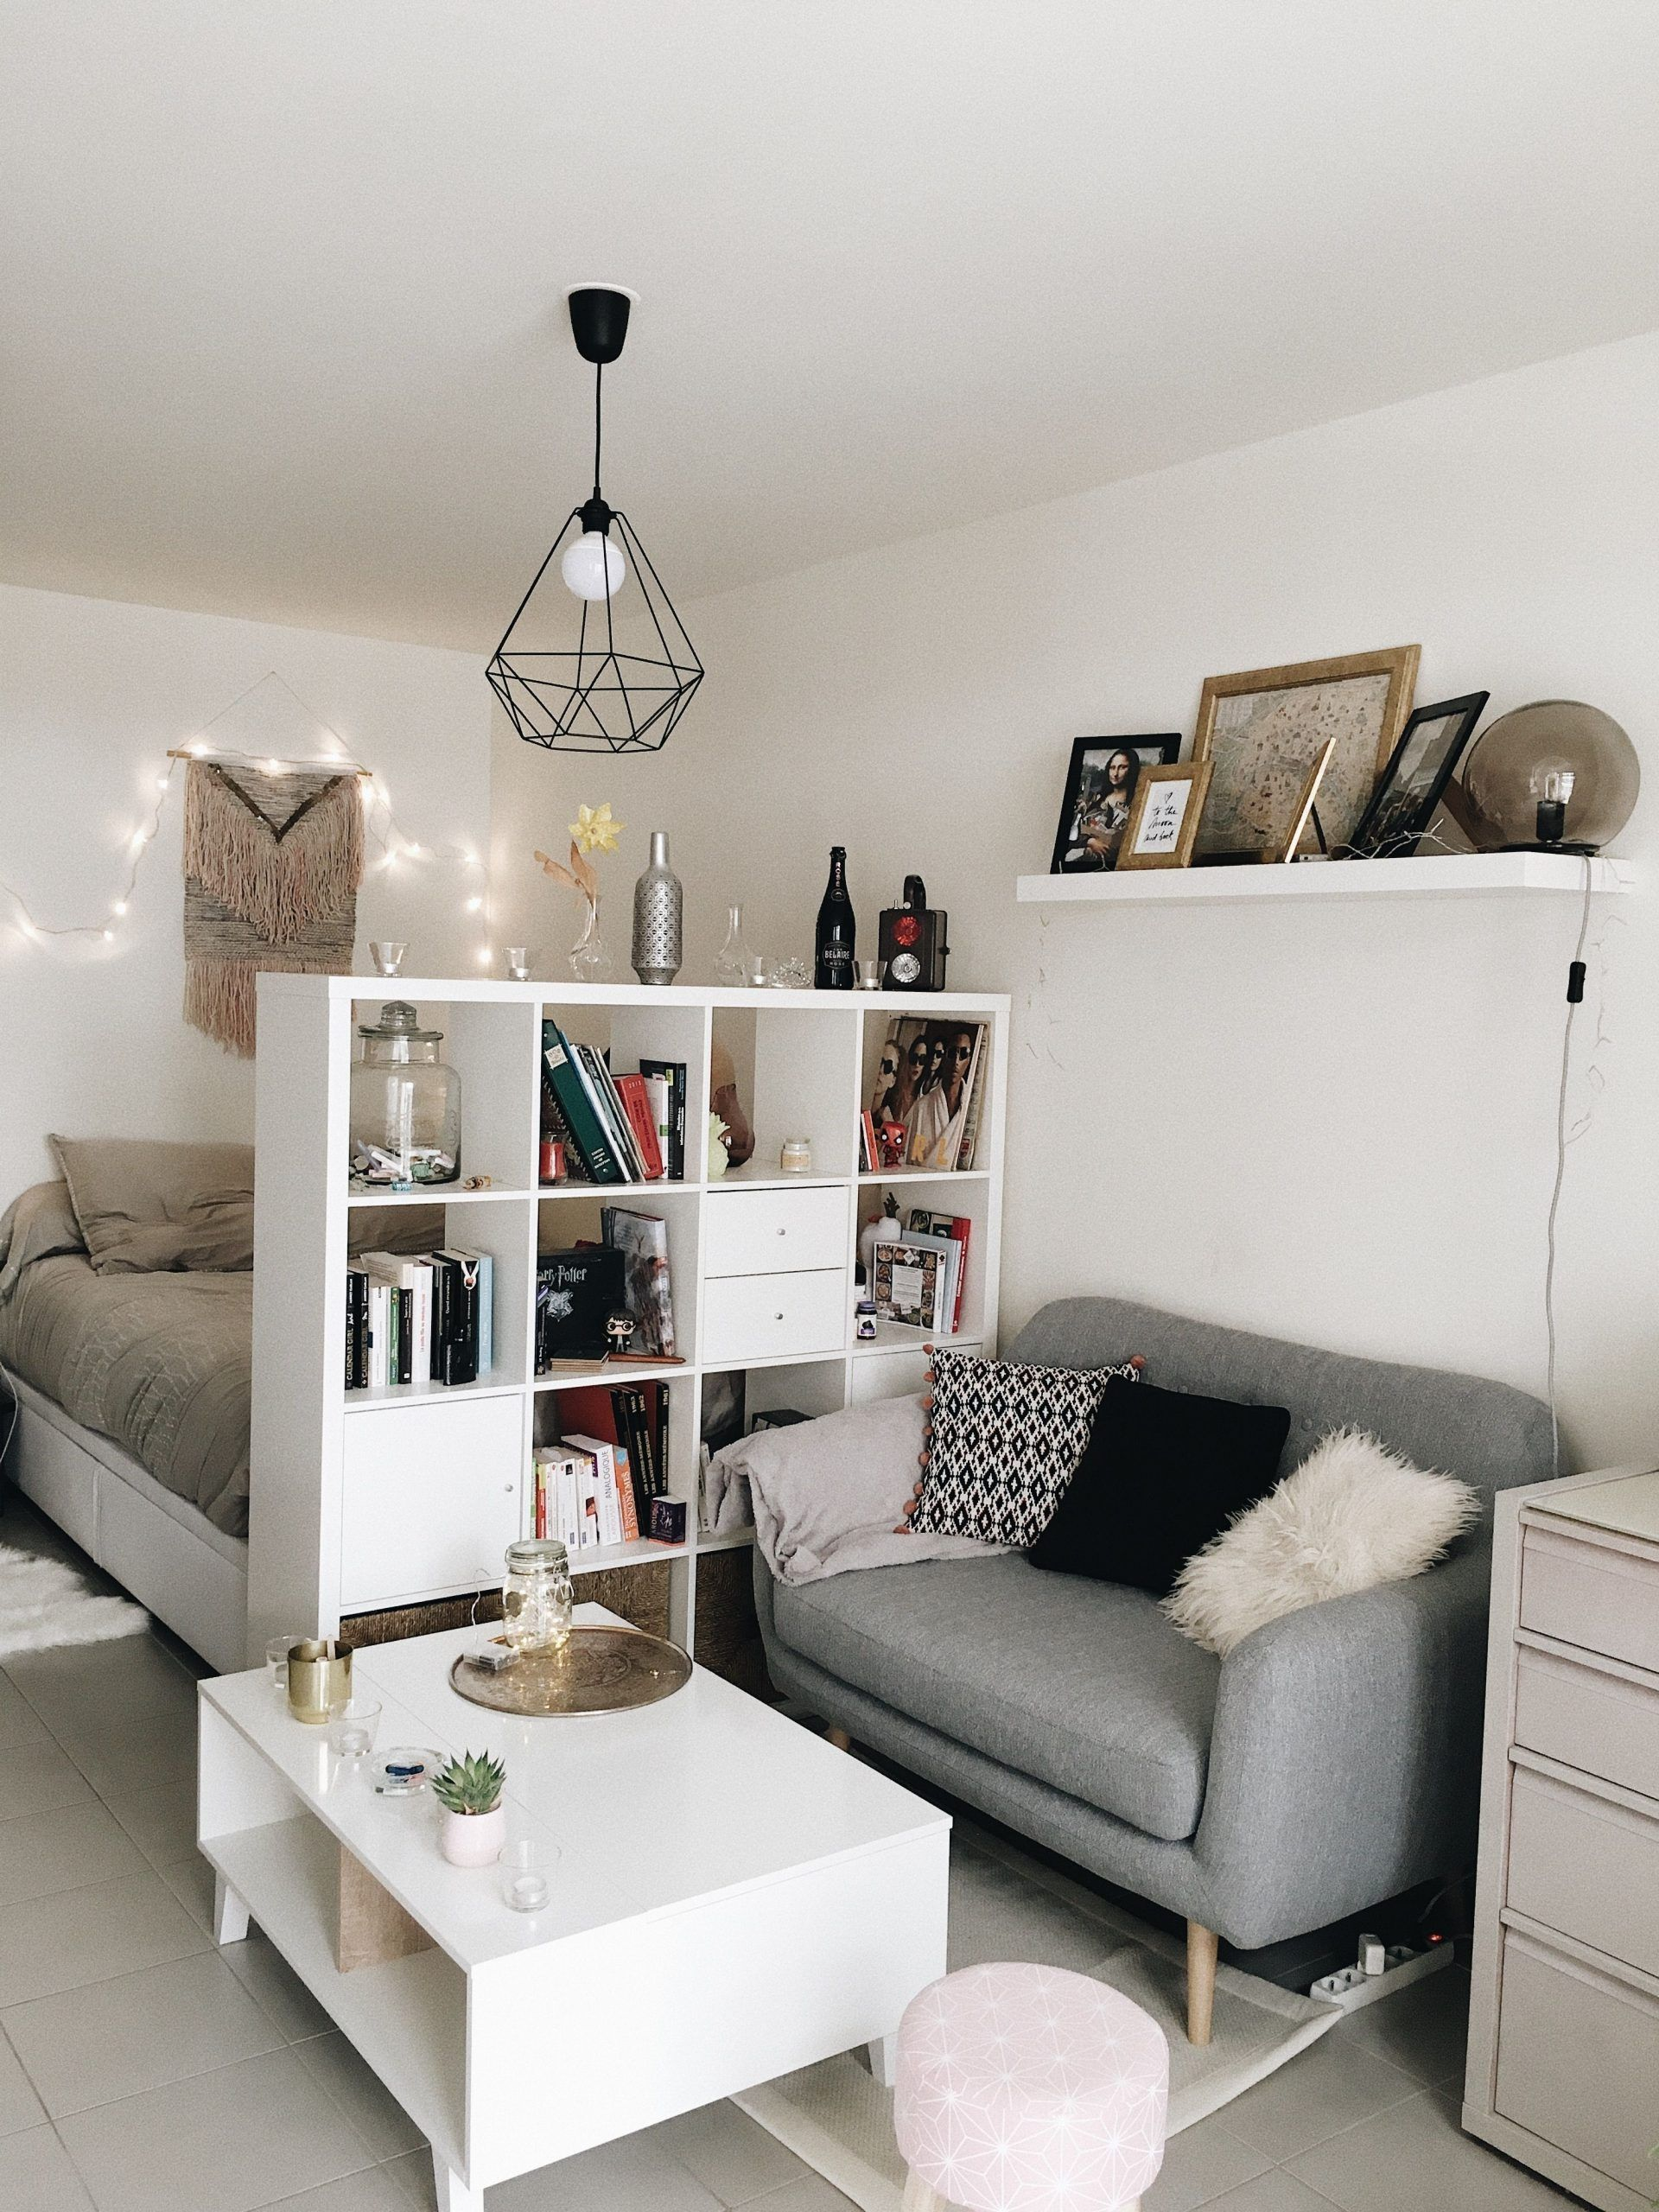 Awesome Studio Apartment Decor Ideas 11 Small Apartment Decorating Apartment Living Room Studio Apartment Decorating